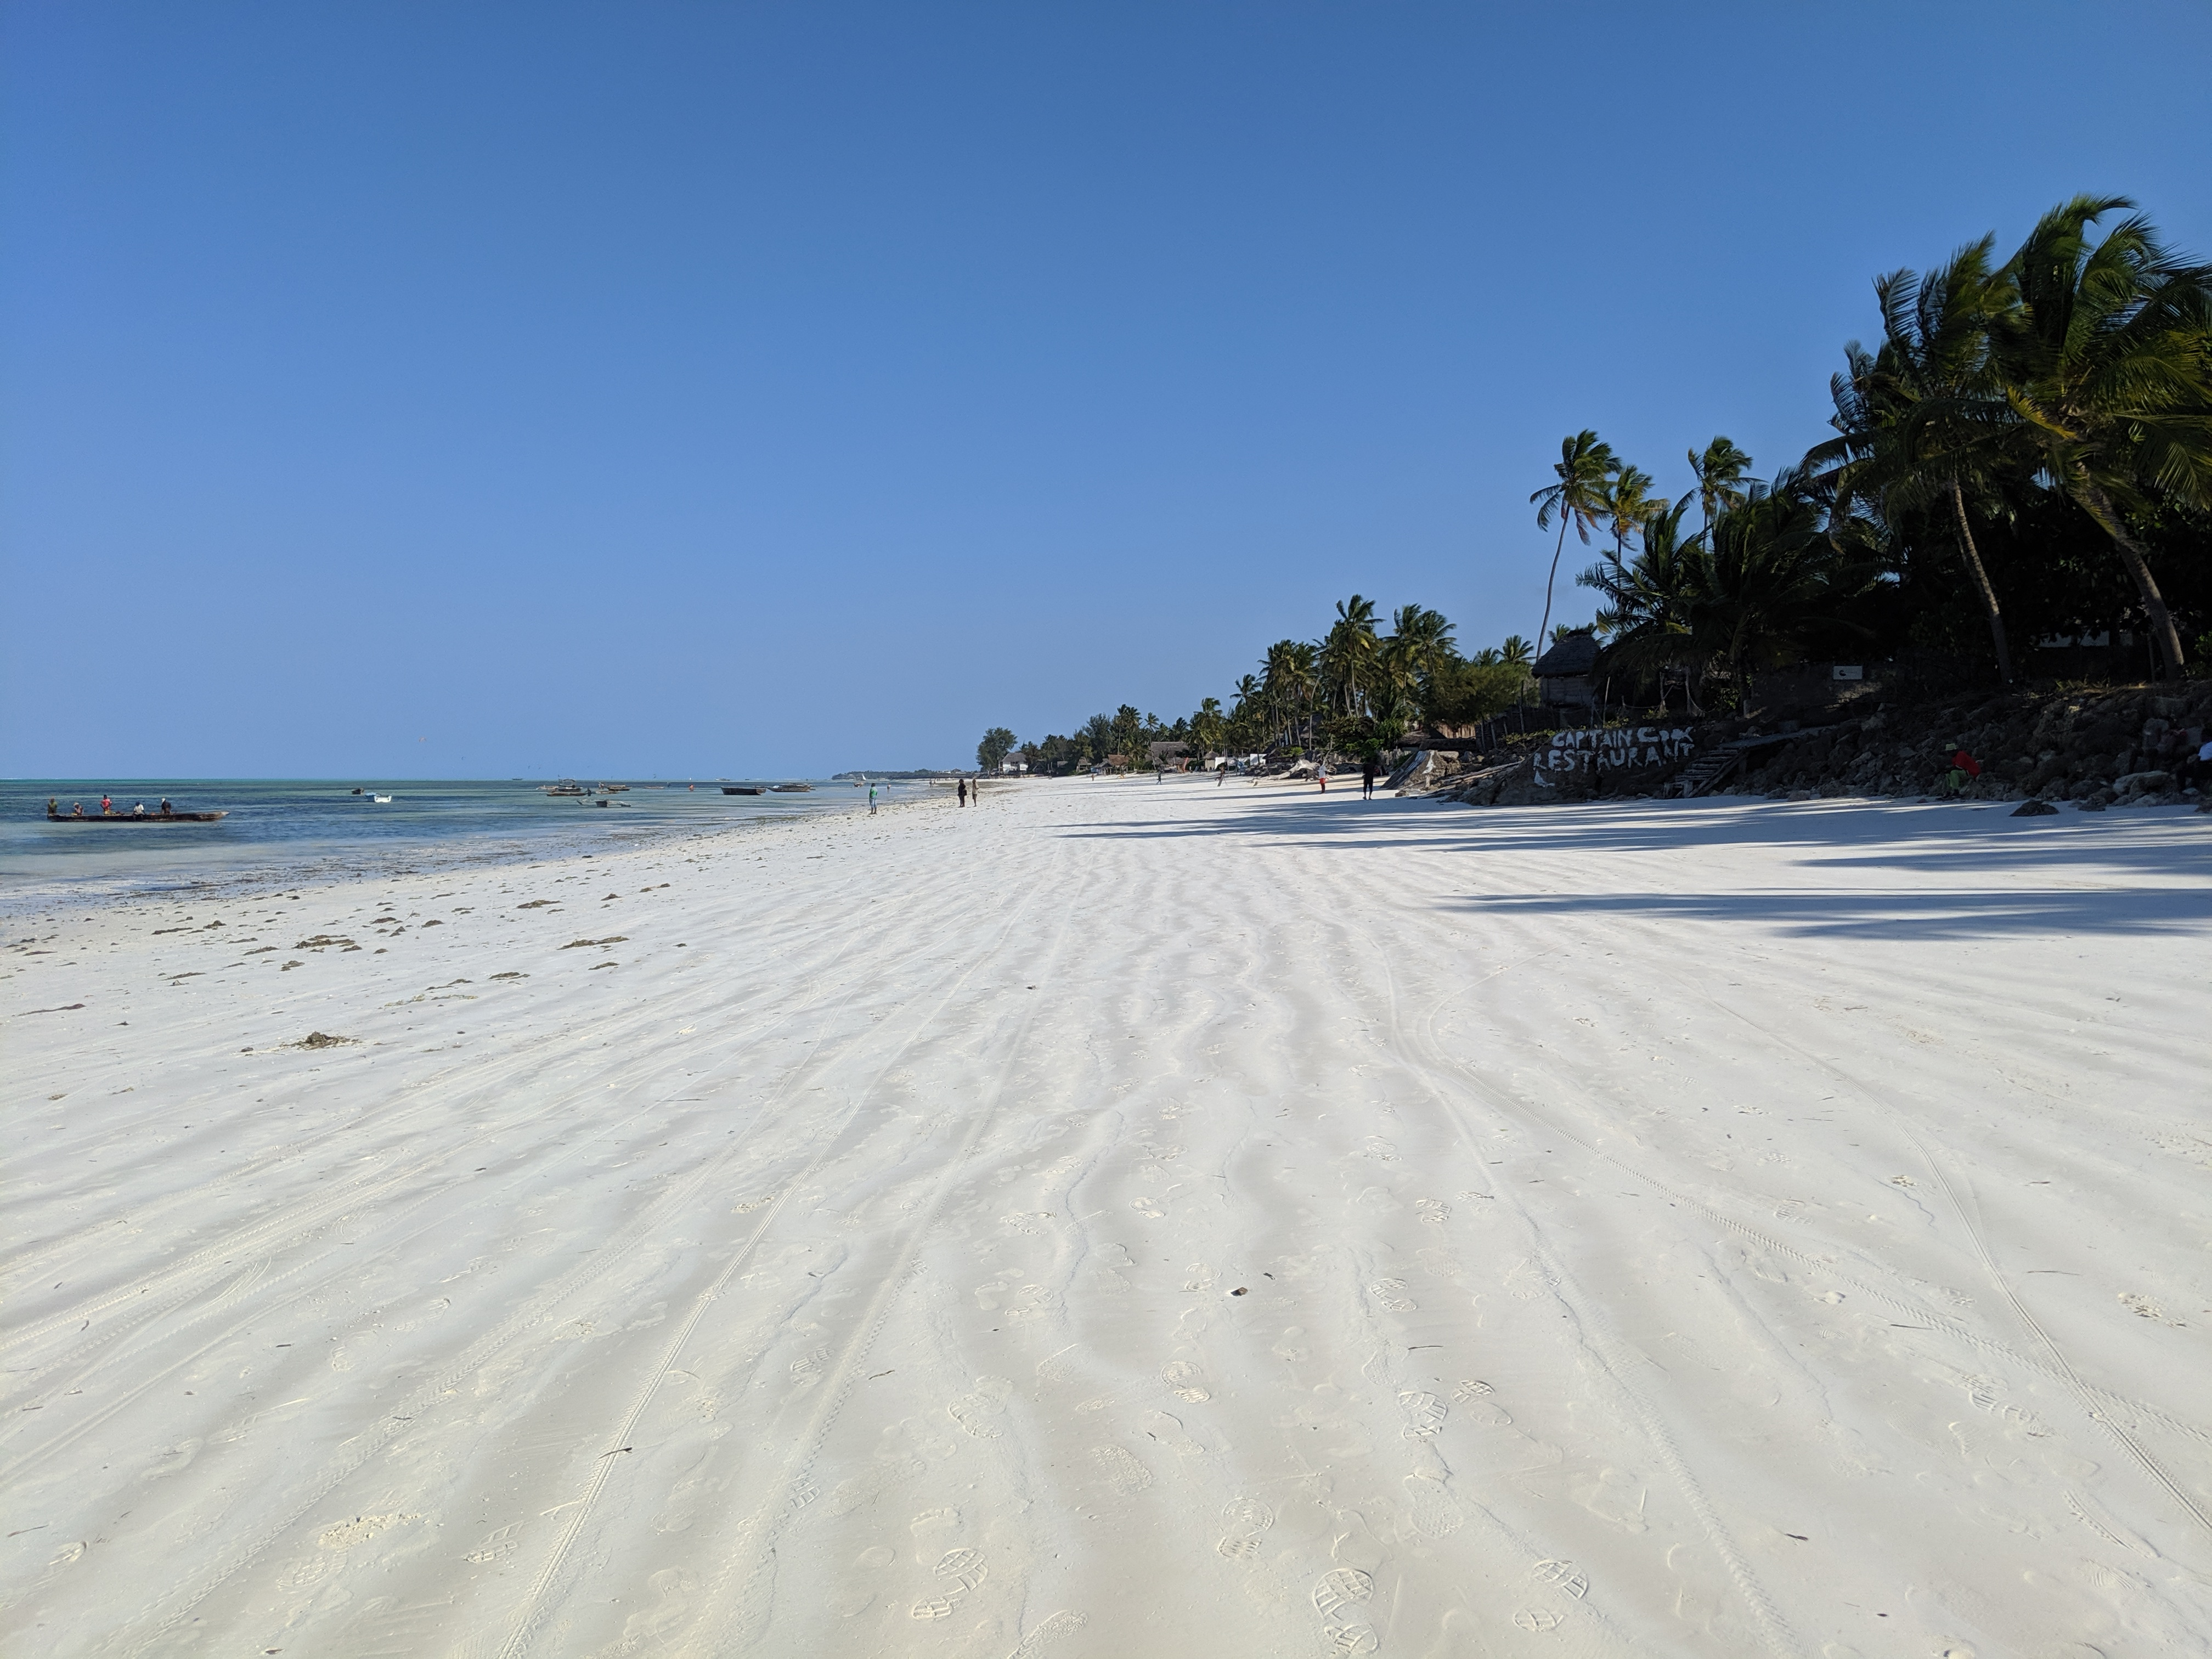 White sand in Jambiani Beach, Zanzibar, Tanzania